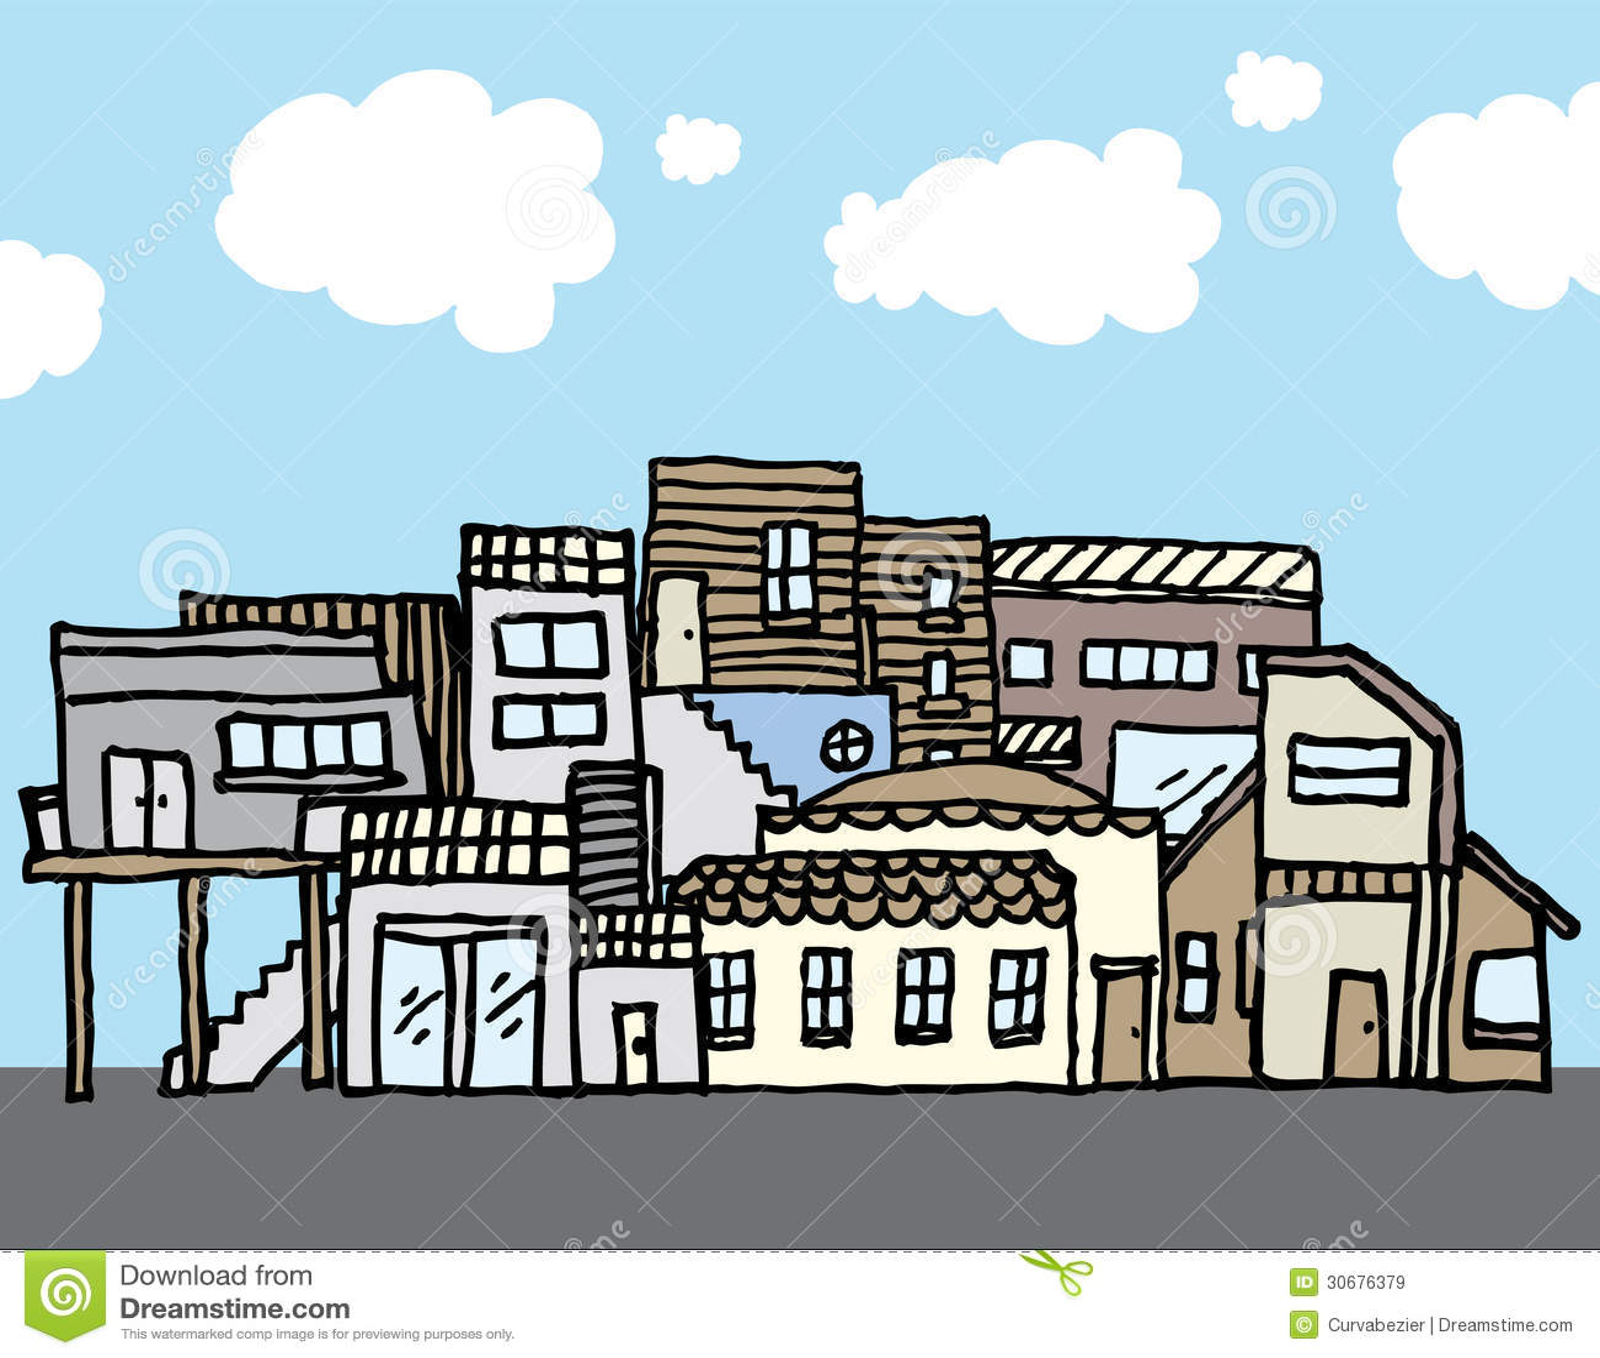 Many Houses / Tight Community Stock Illustration